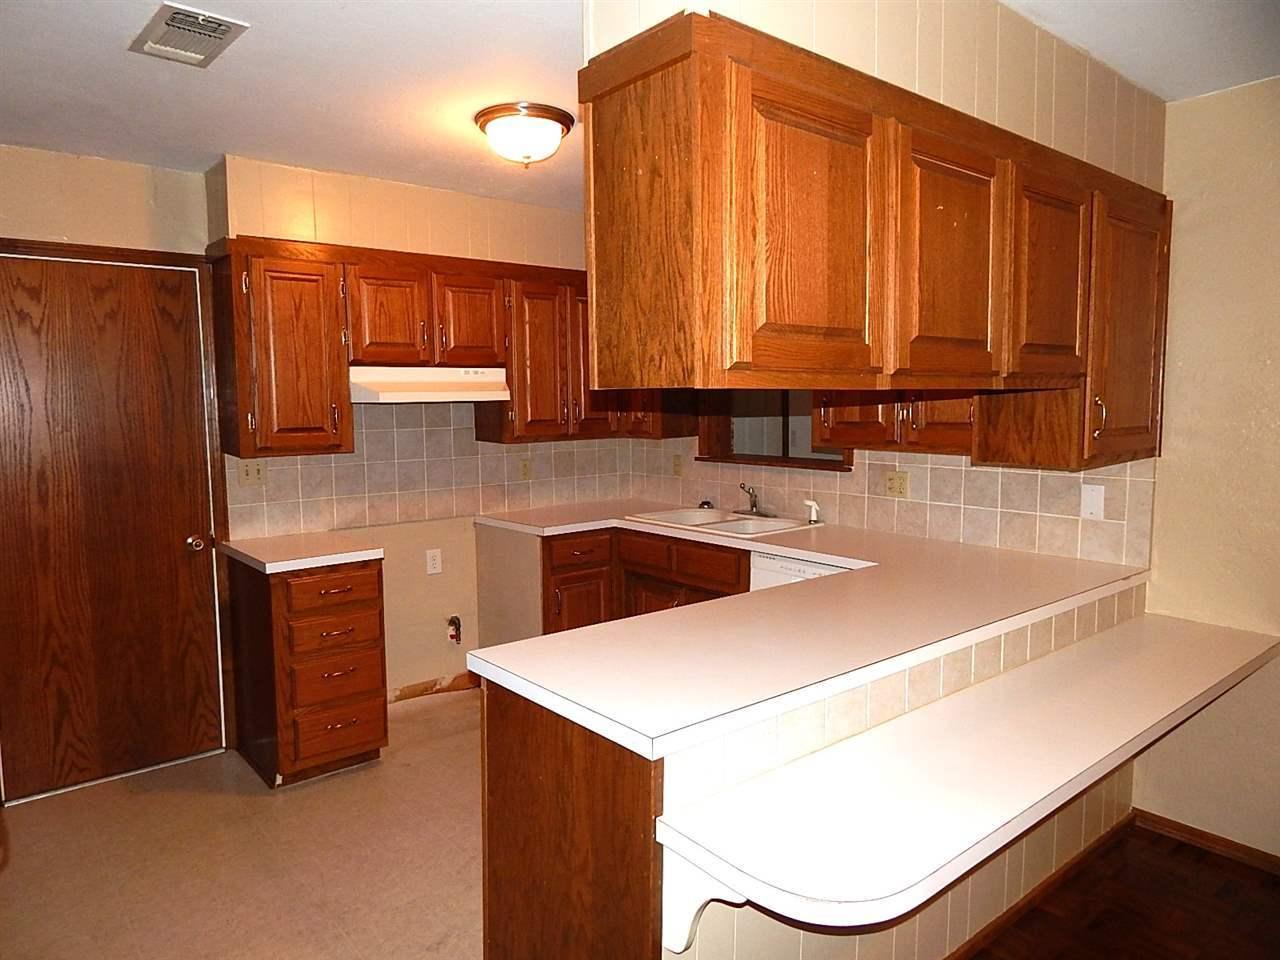 Sold Intraoffice W/MLS | 3410 Meadow Lane Ponca City, OK 74604 6